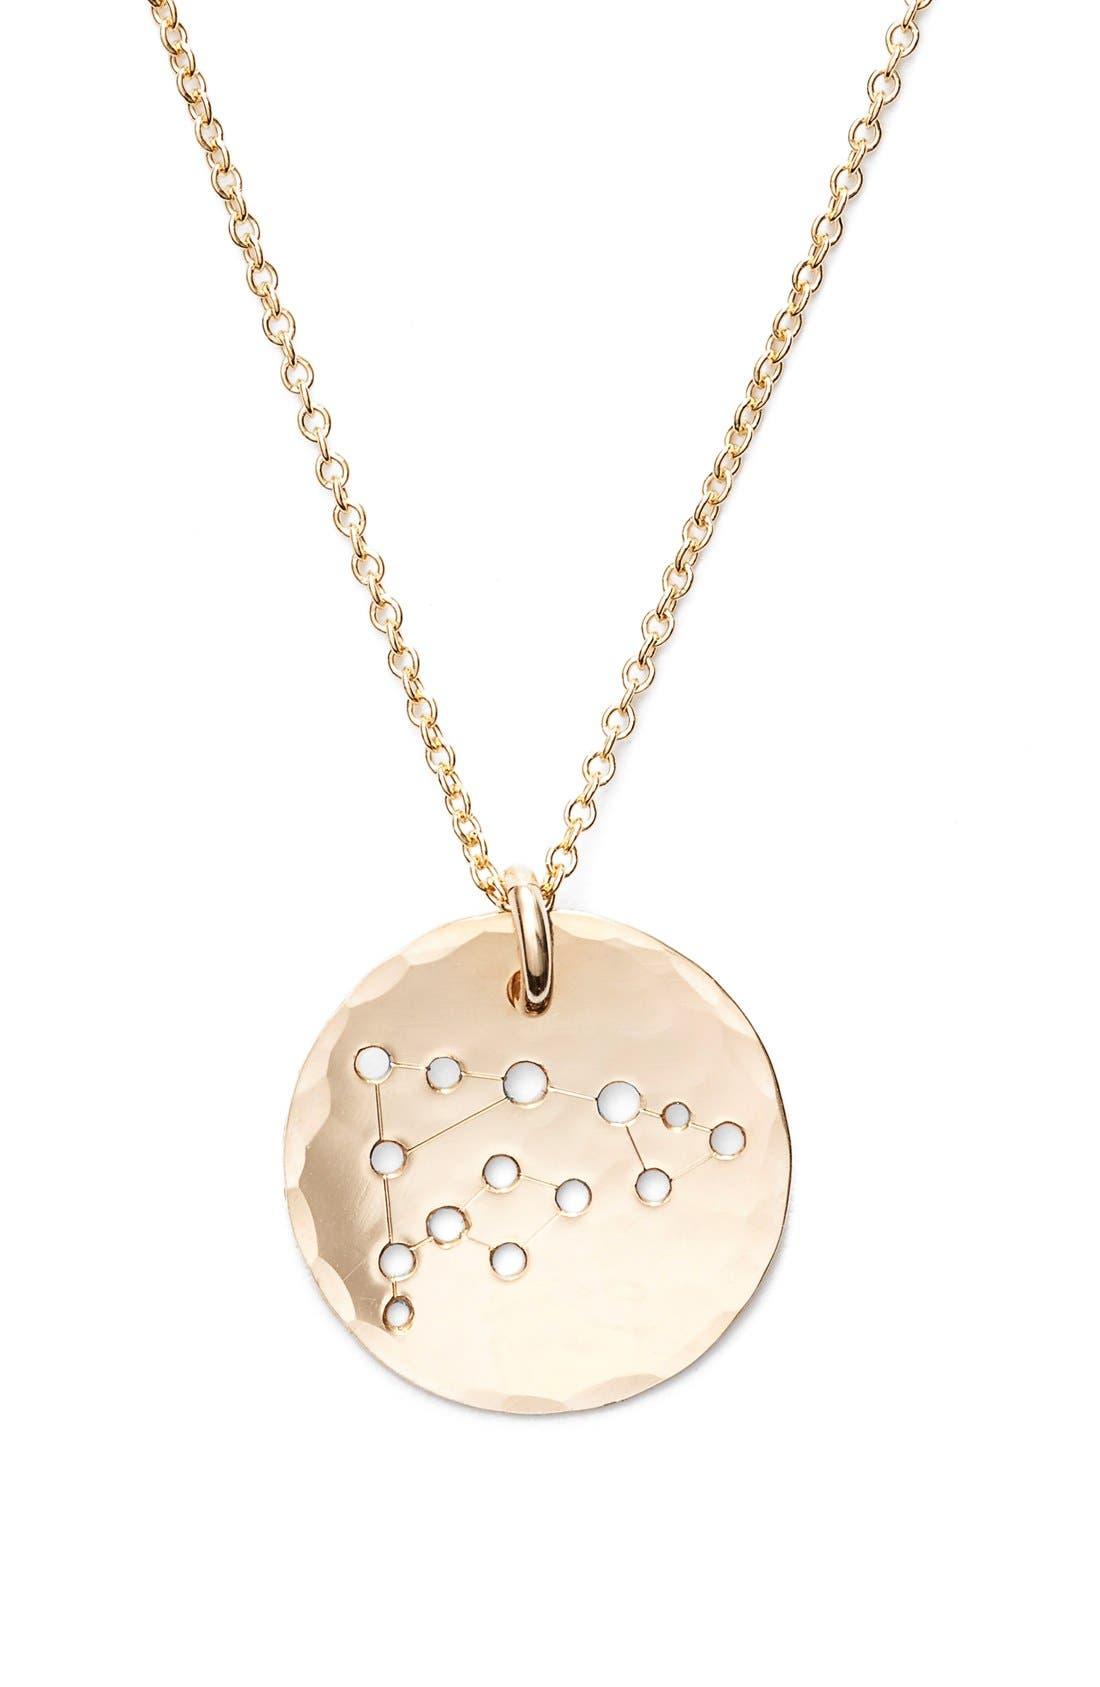 Ija 'Small Zodiac' 14k-Gold Fill Necklace,                             Alternate thumbnail 35, color,